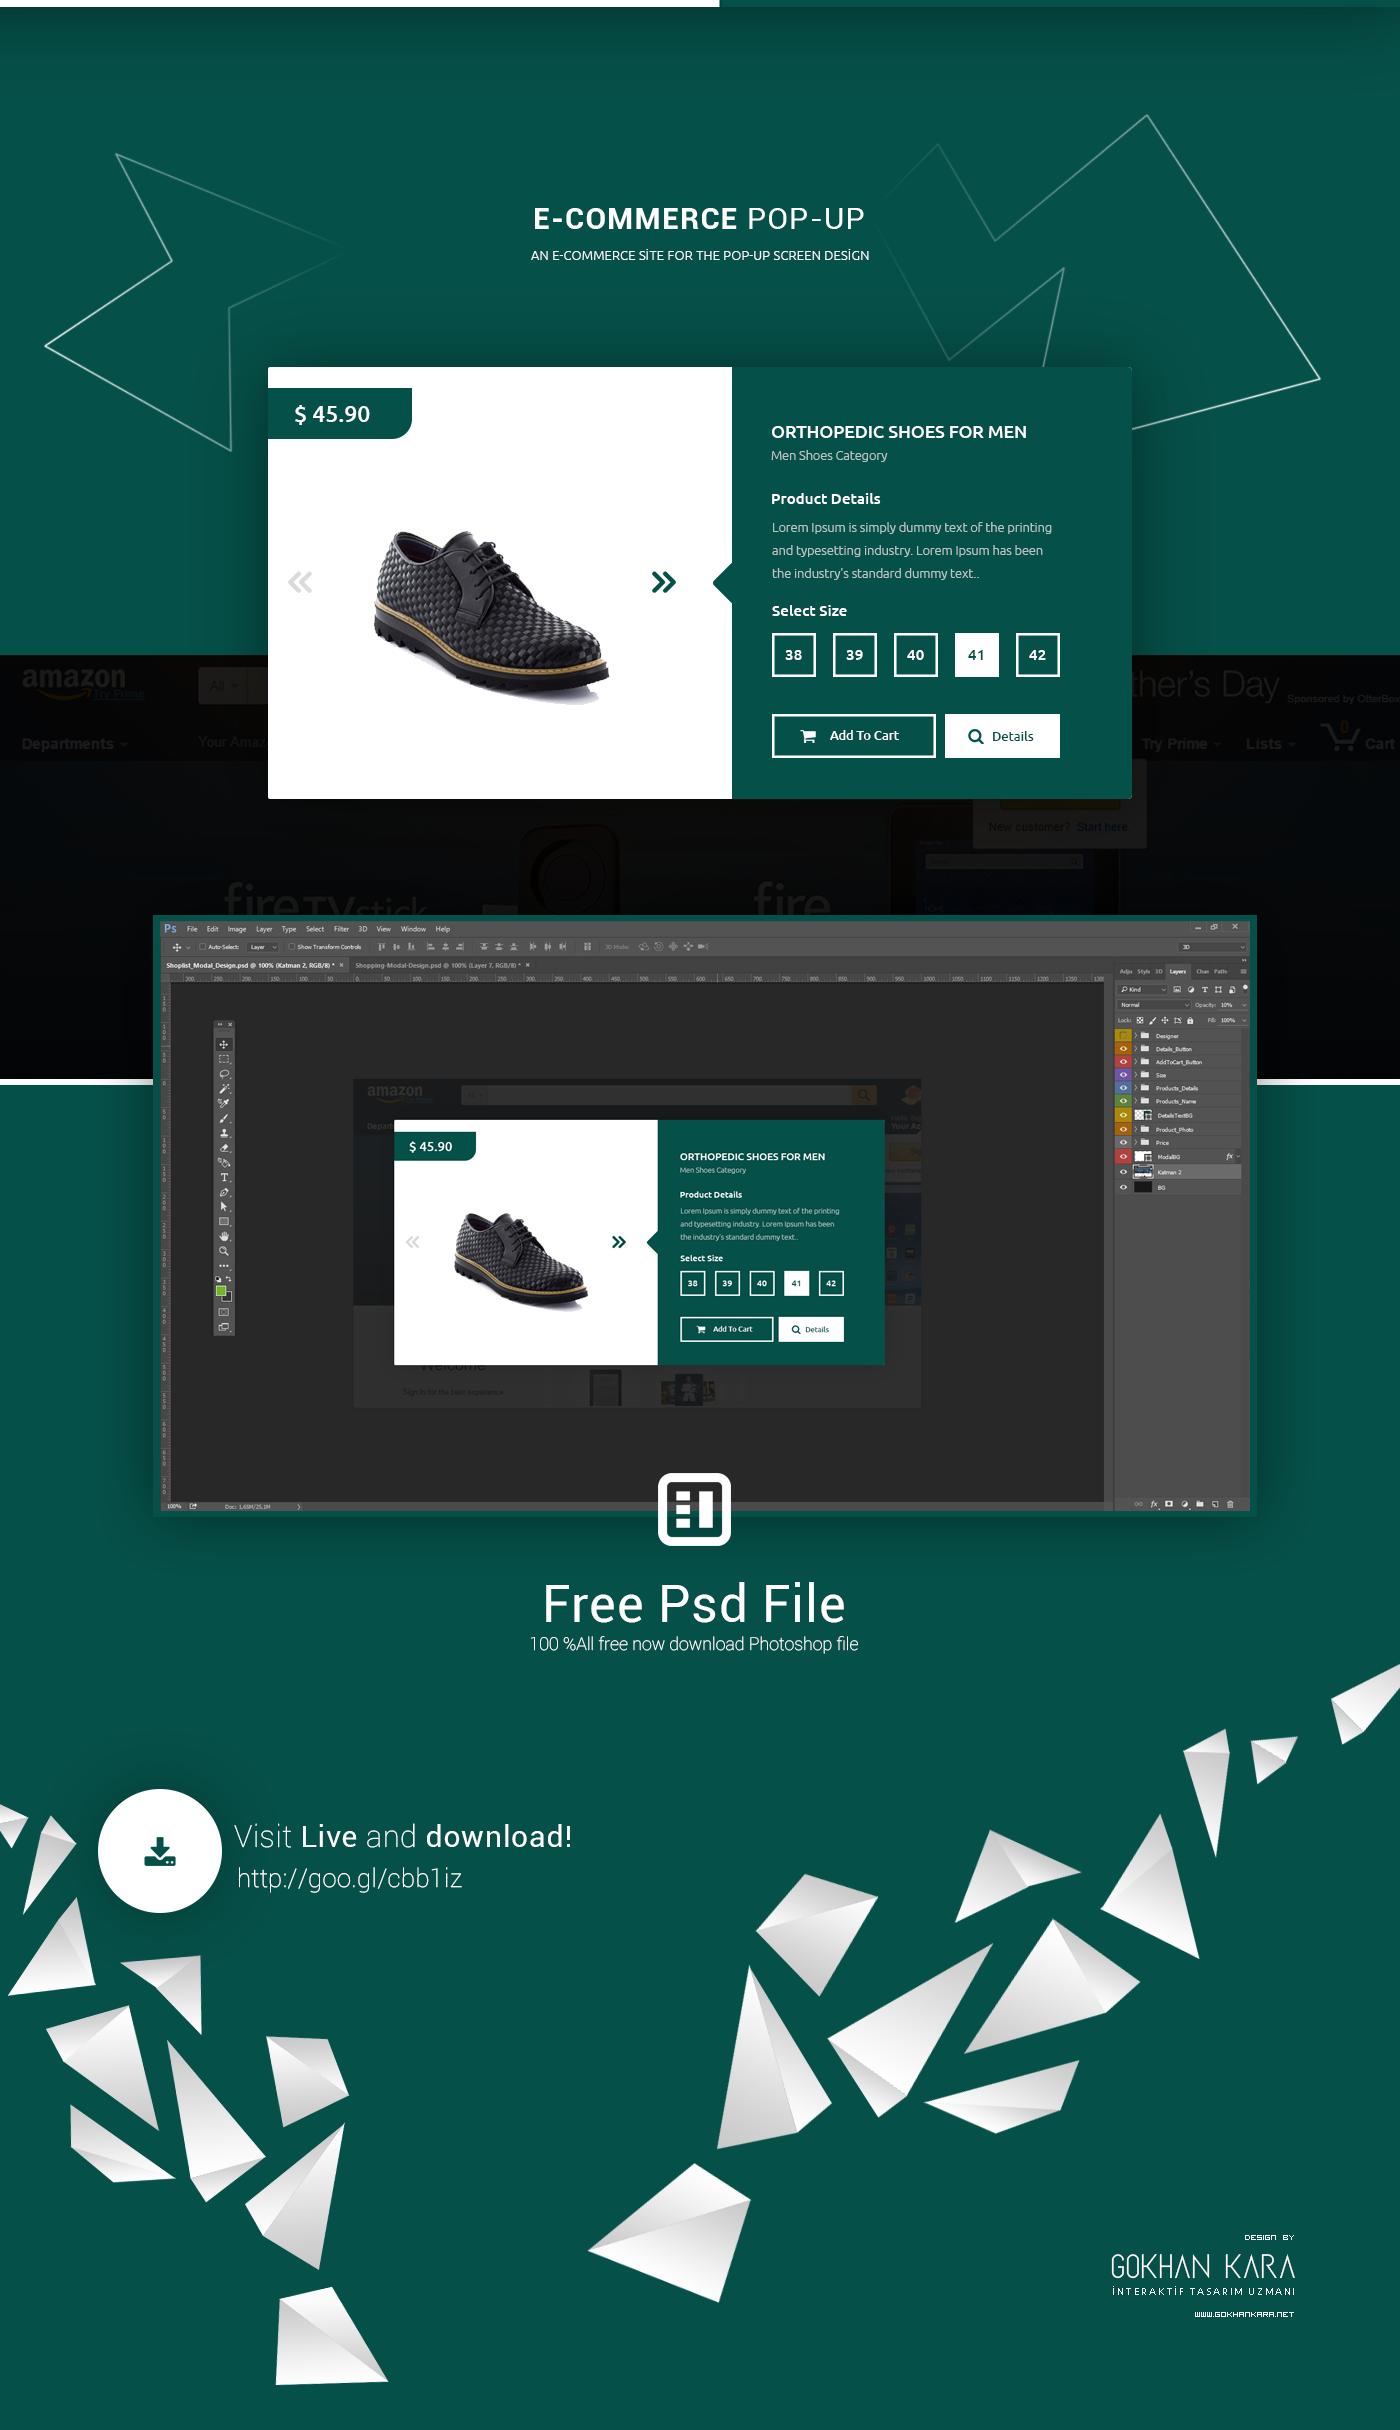 modal design,Web Interface Design,free psd,psd,free,Gökhan KARA